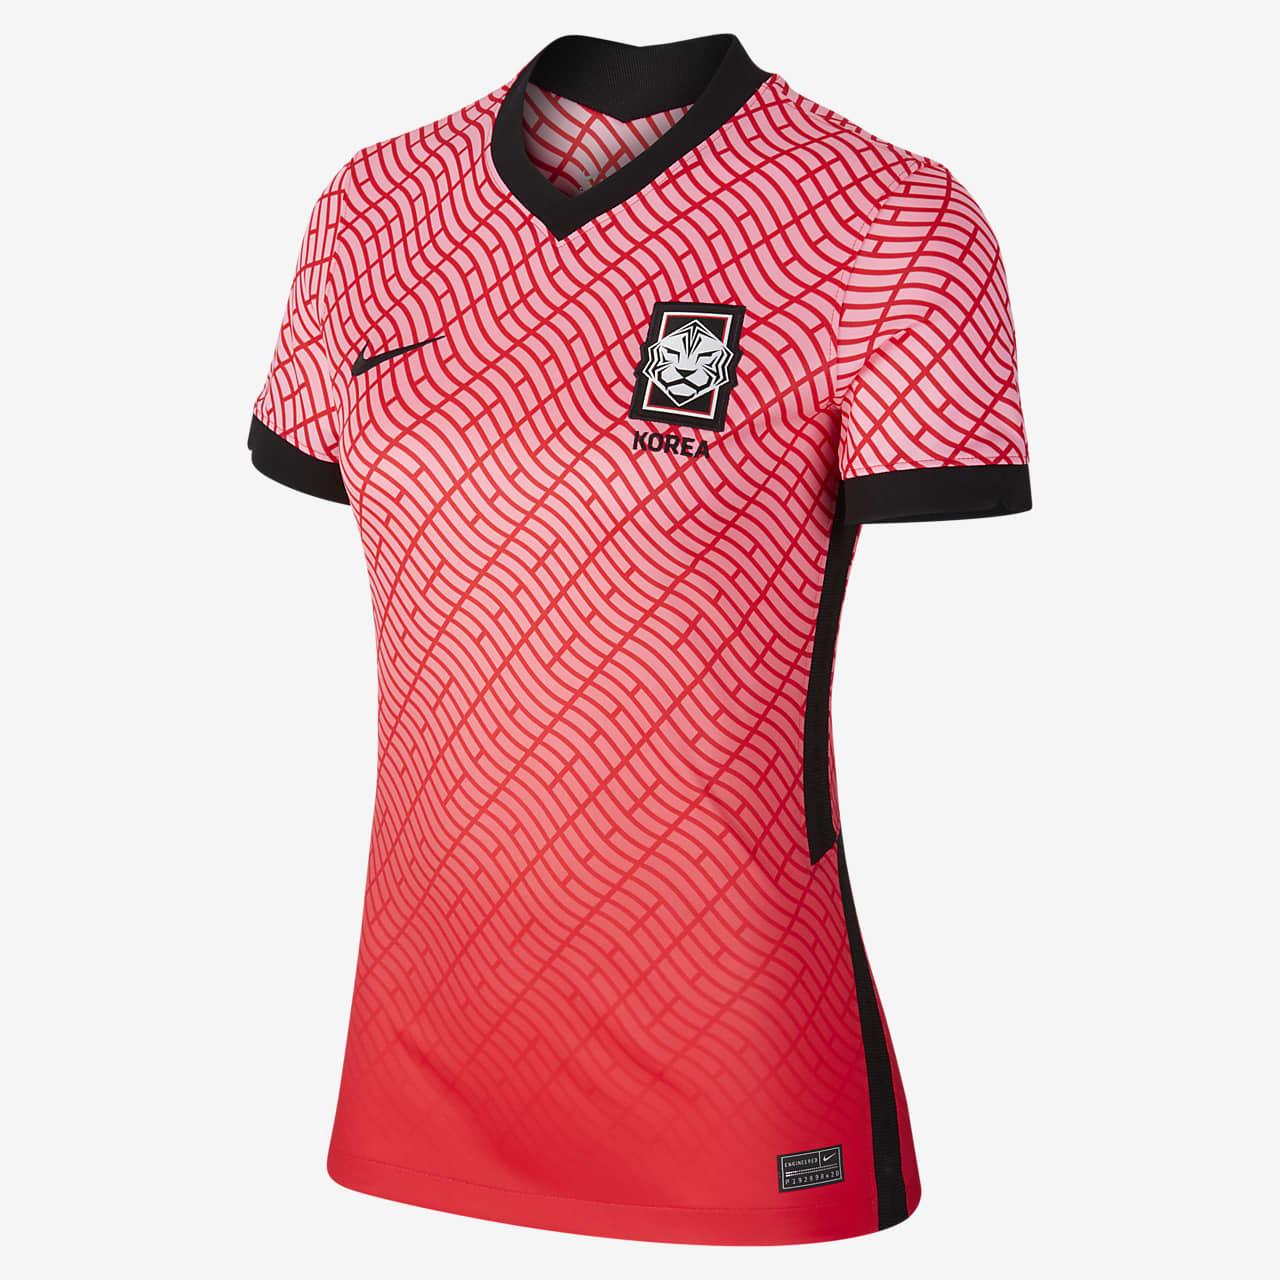 Korea 2020 Stadium Home Women's Football Shirt